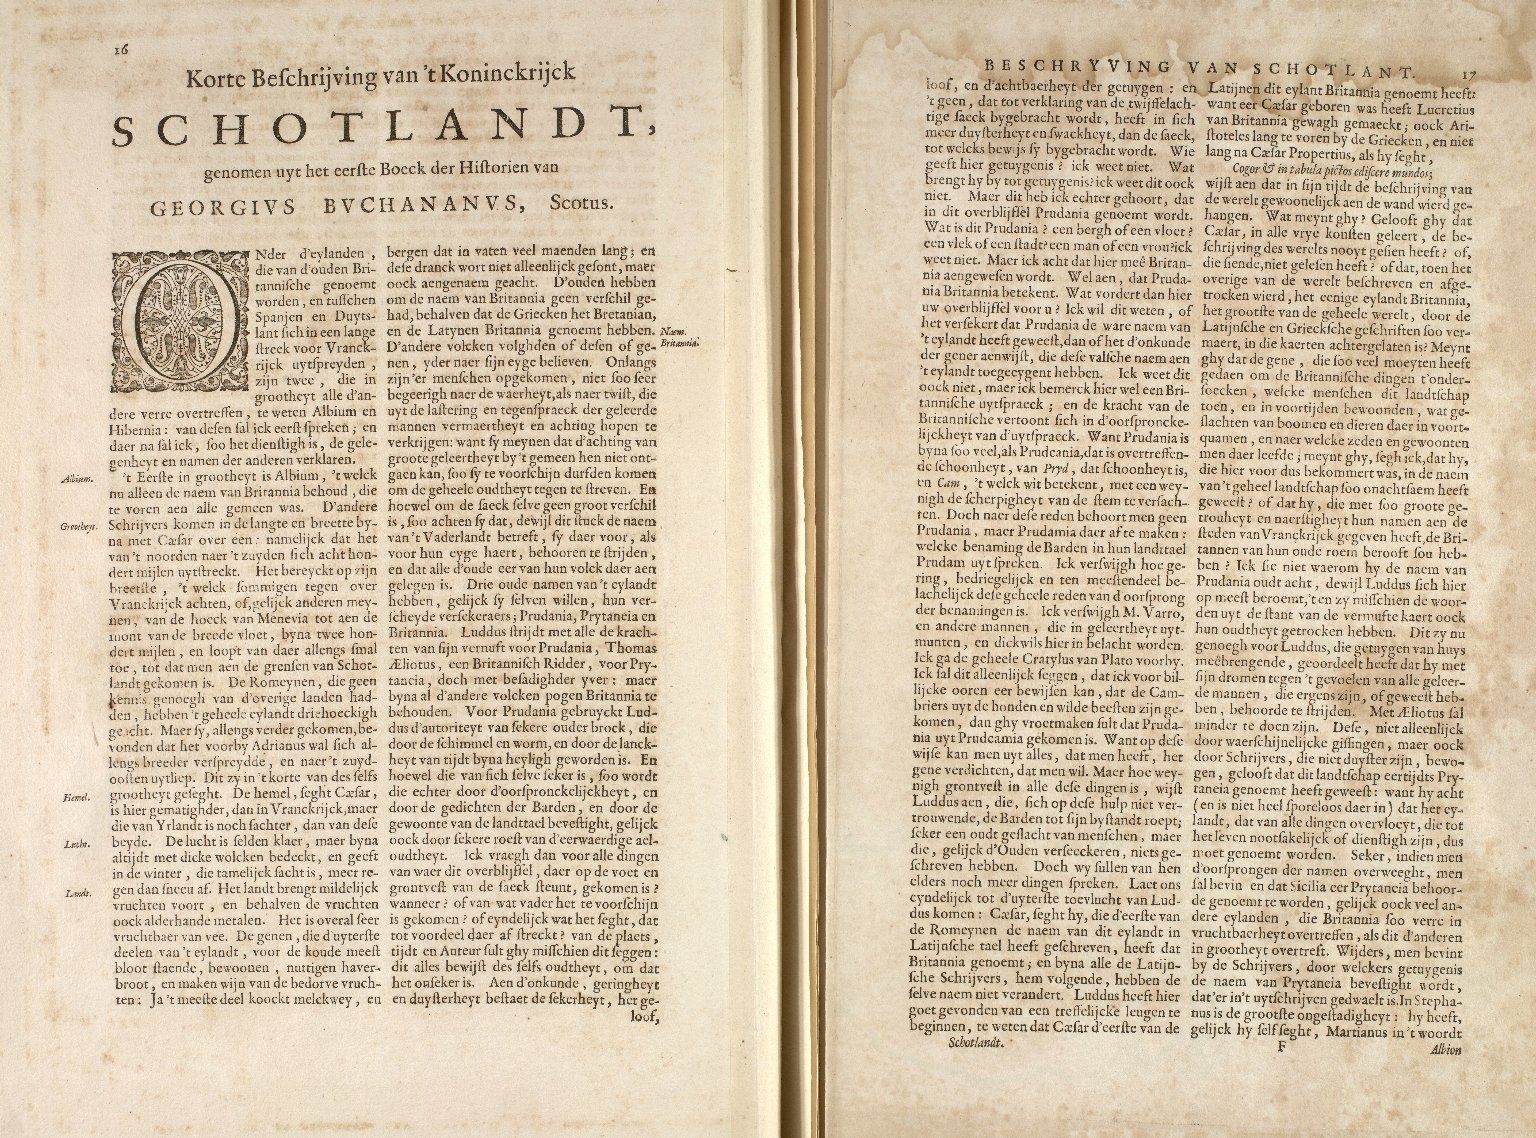 [Geographiae Blavianae] [Also known as: Atlas major] [018 of 153]